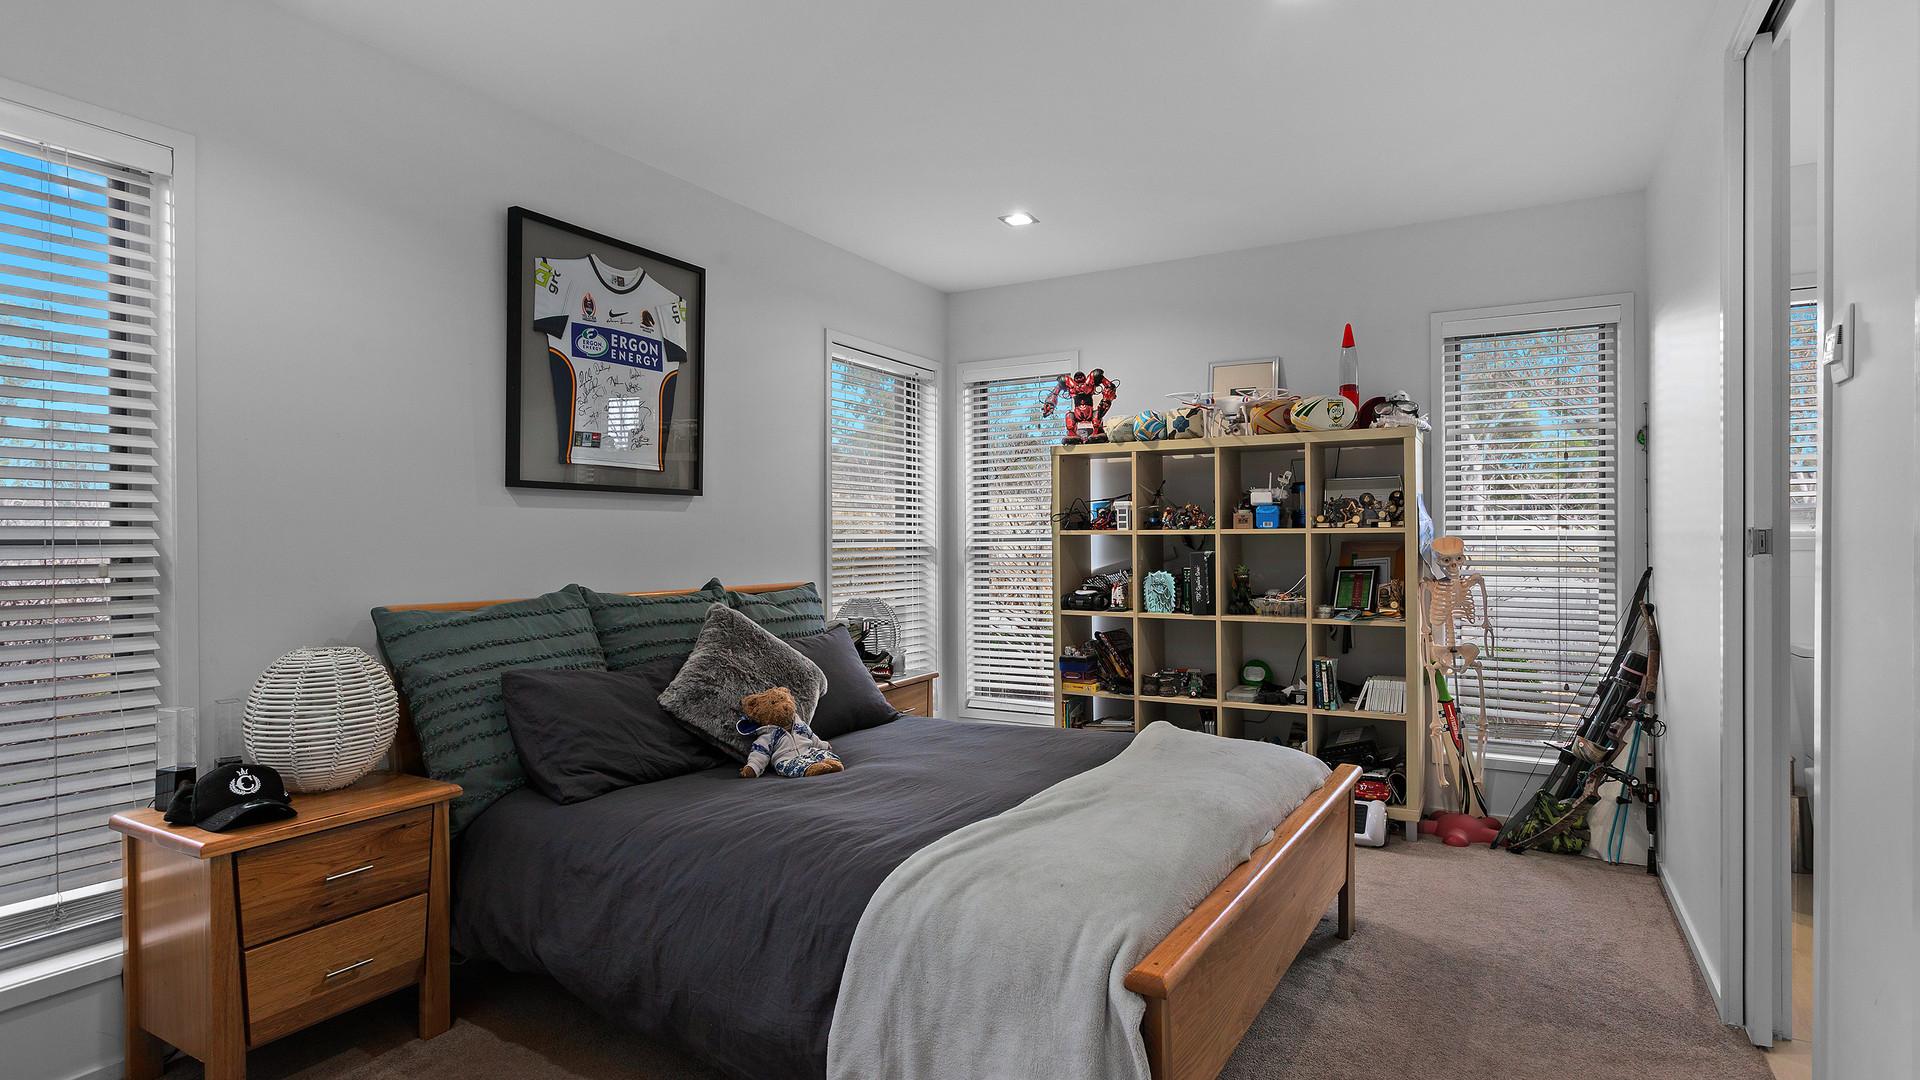 Second kid's room